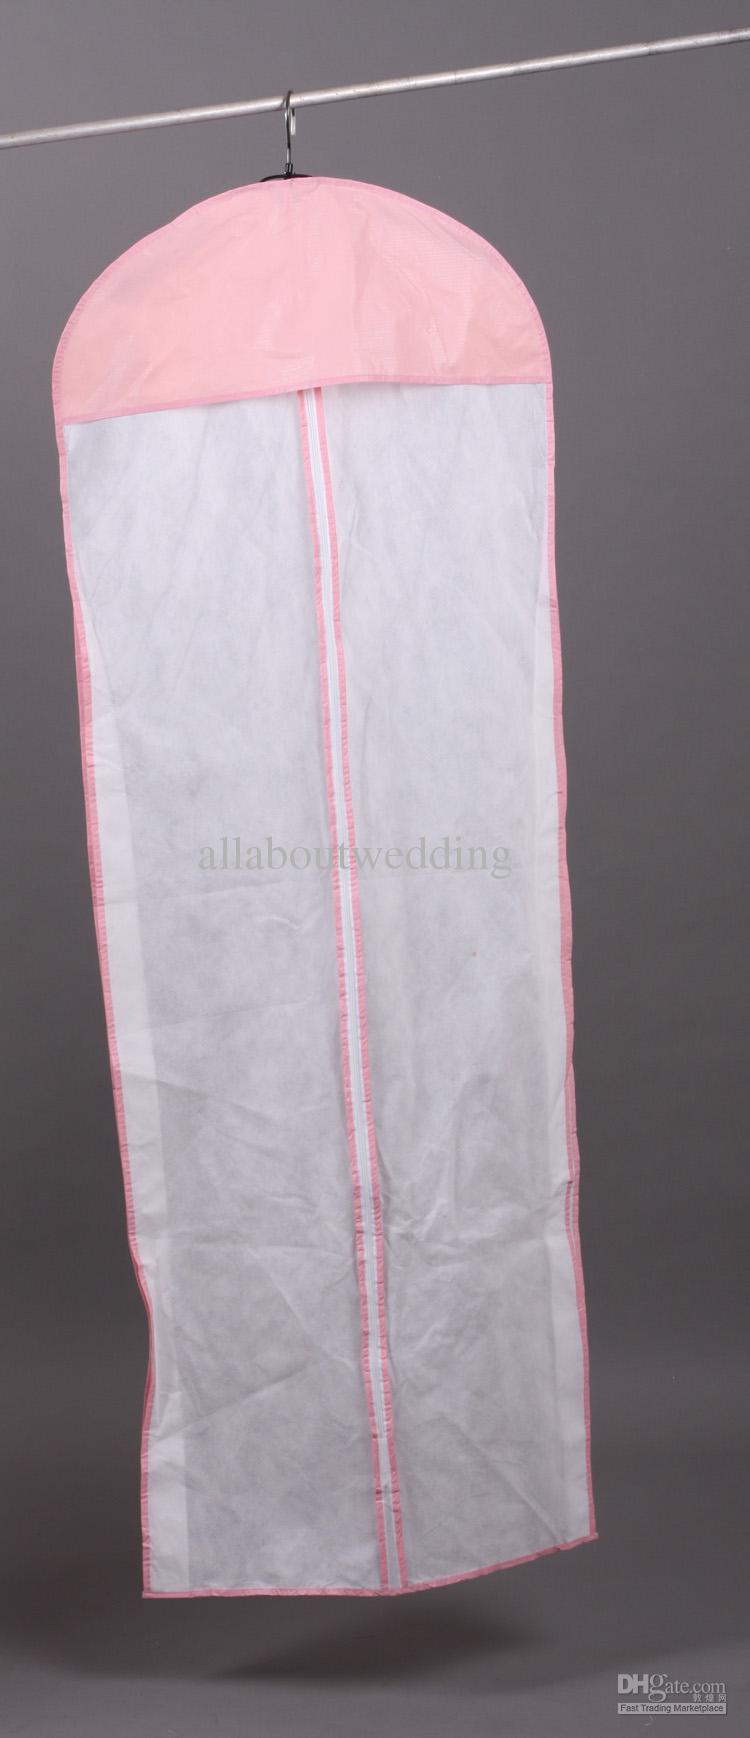 Brand New No Signage Cheap Wedding Dress Bag Garment Cover Travel